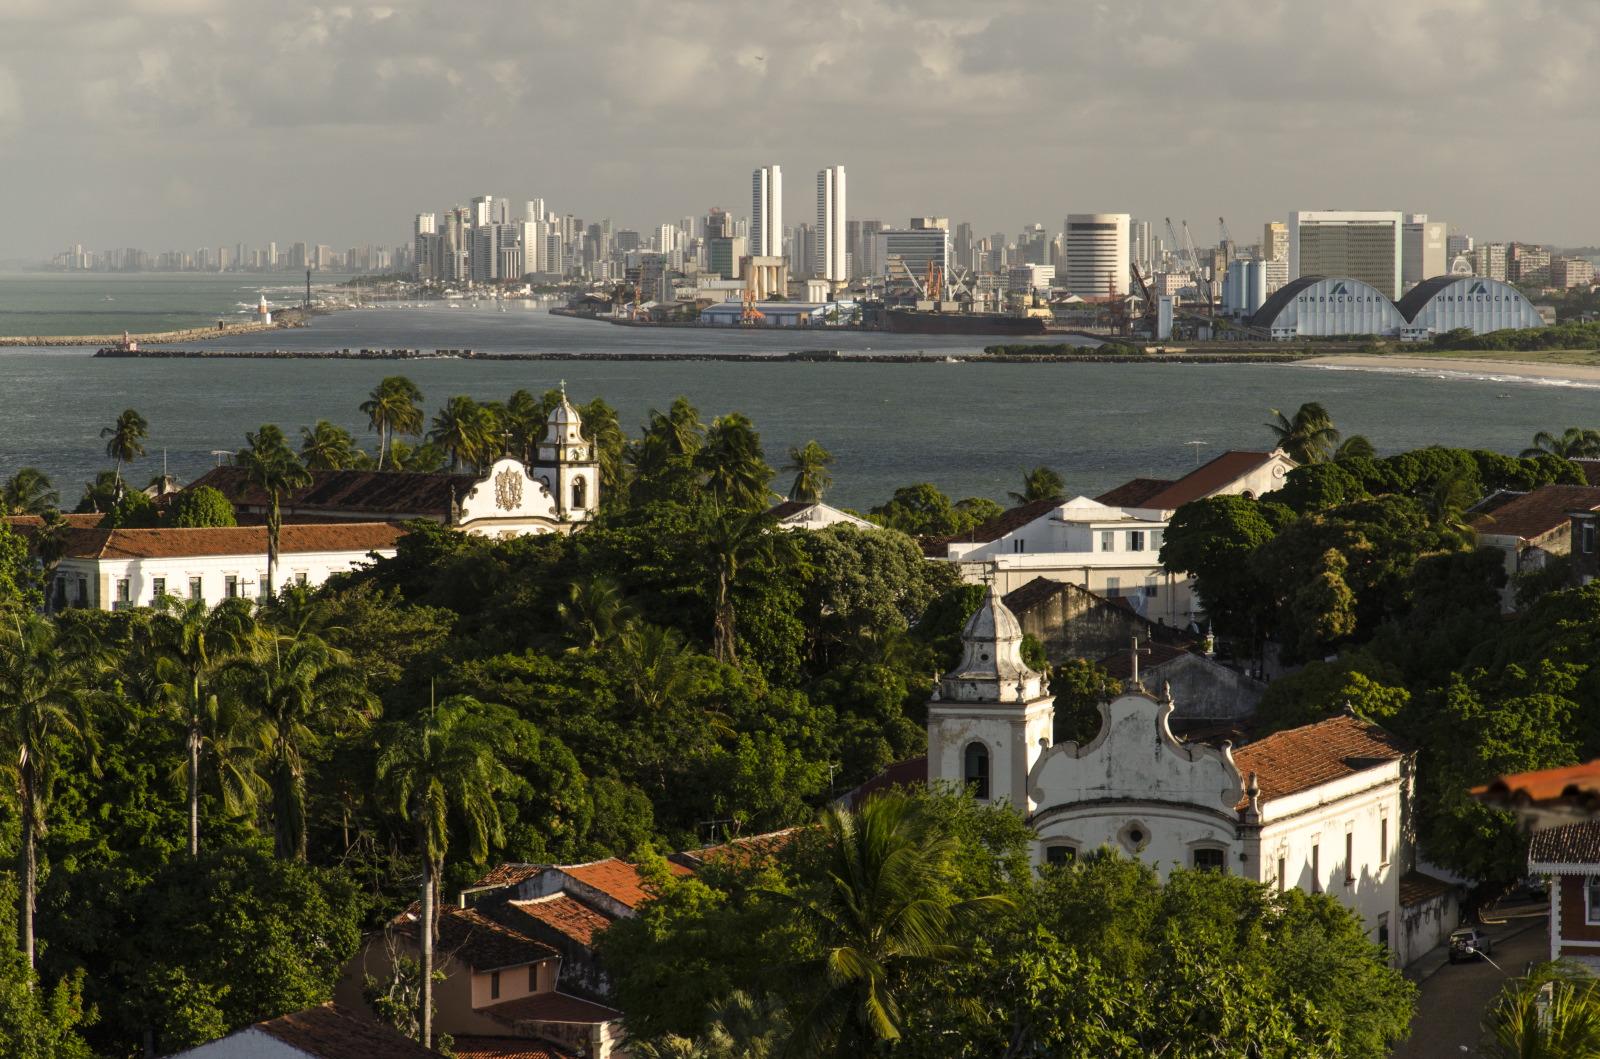 Guararapes International Airport, IATA REC, Recife - Airport Technology